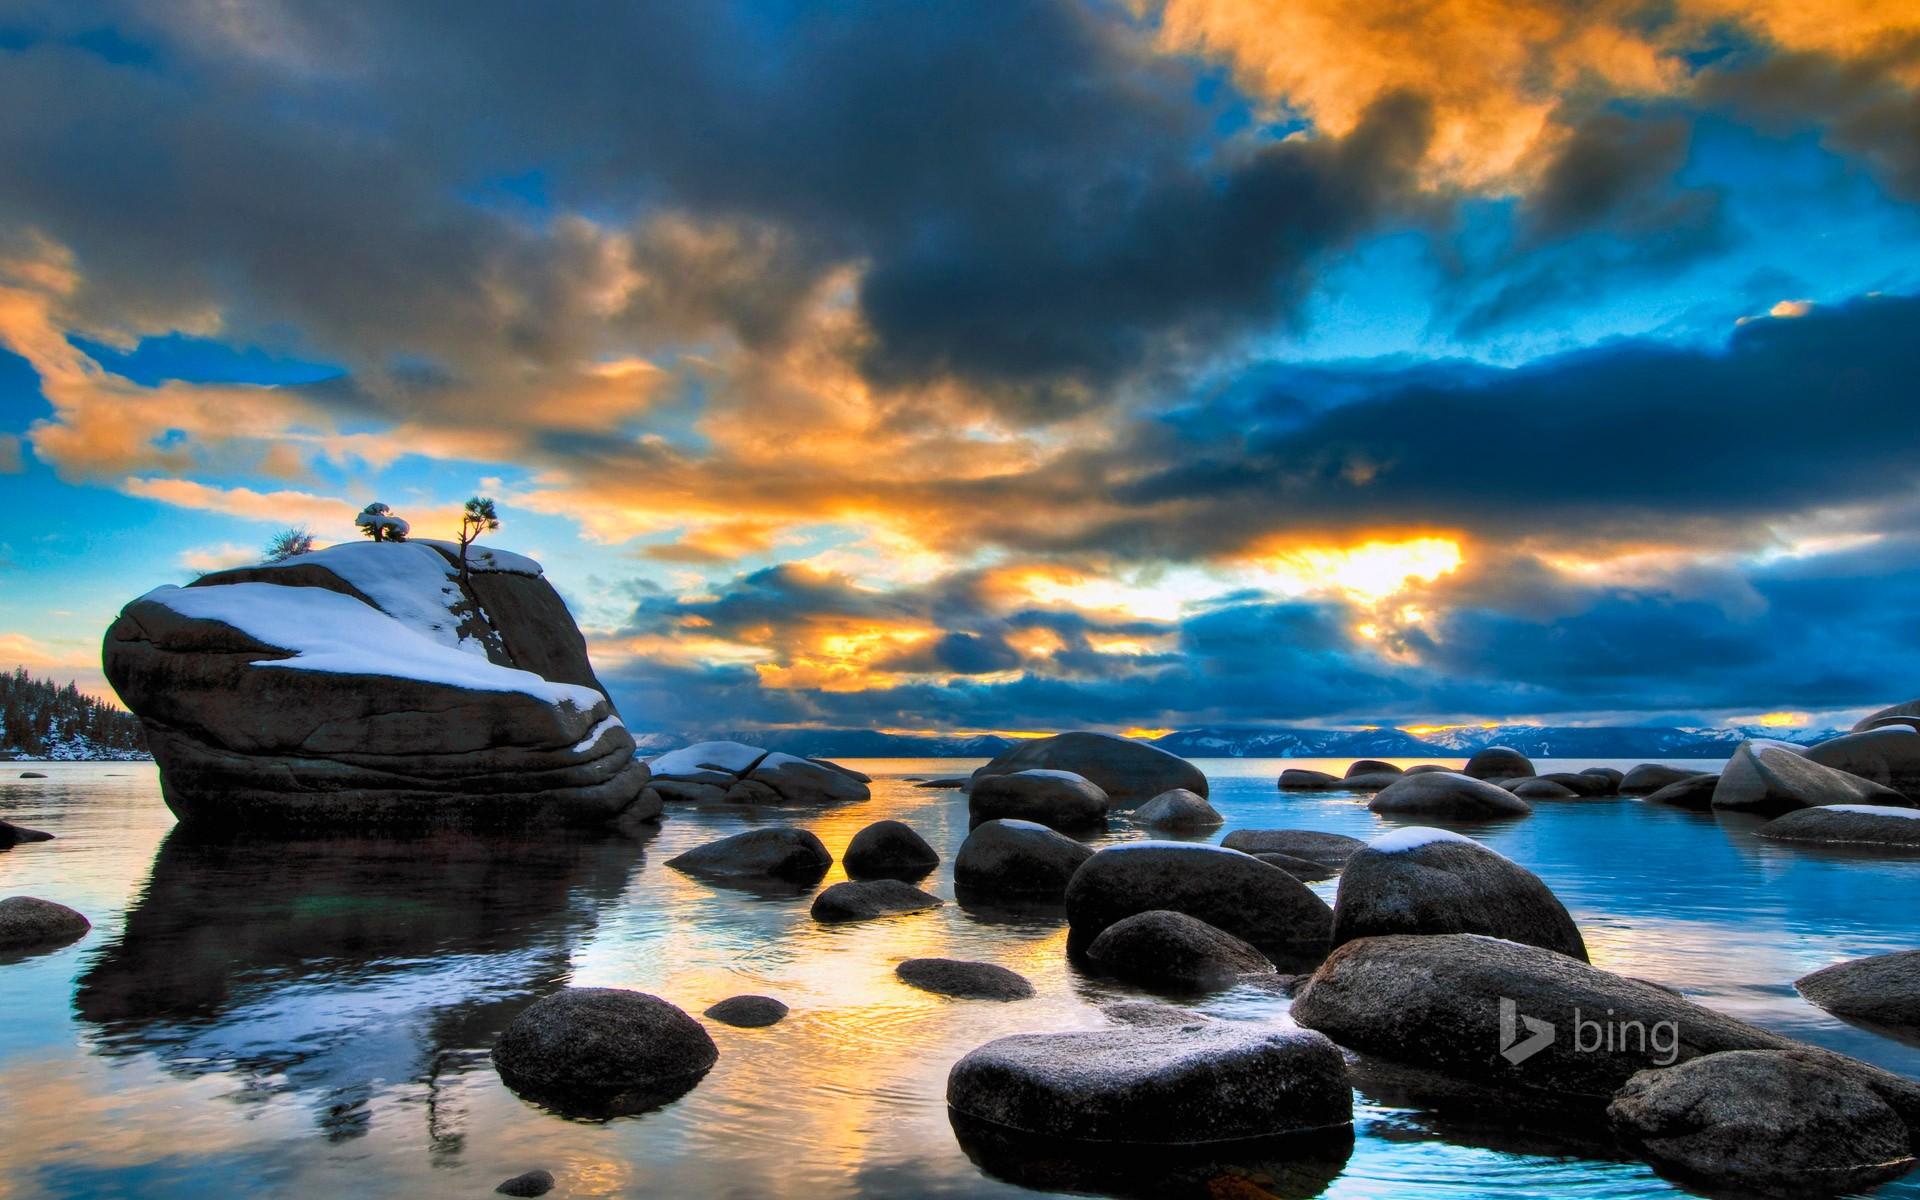 солнце вода камни картинки